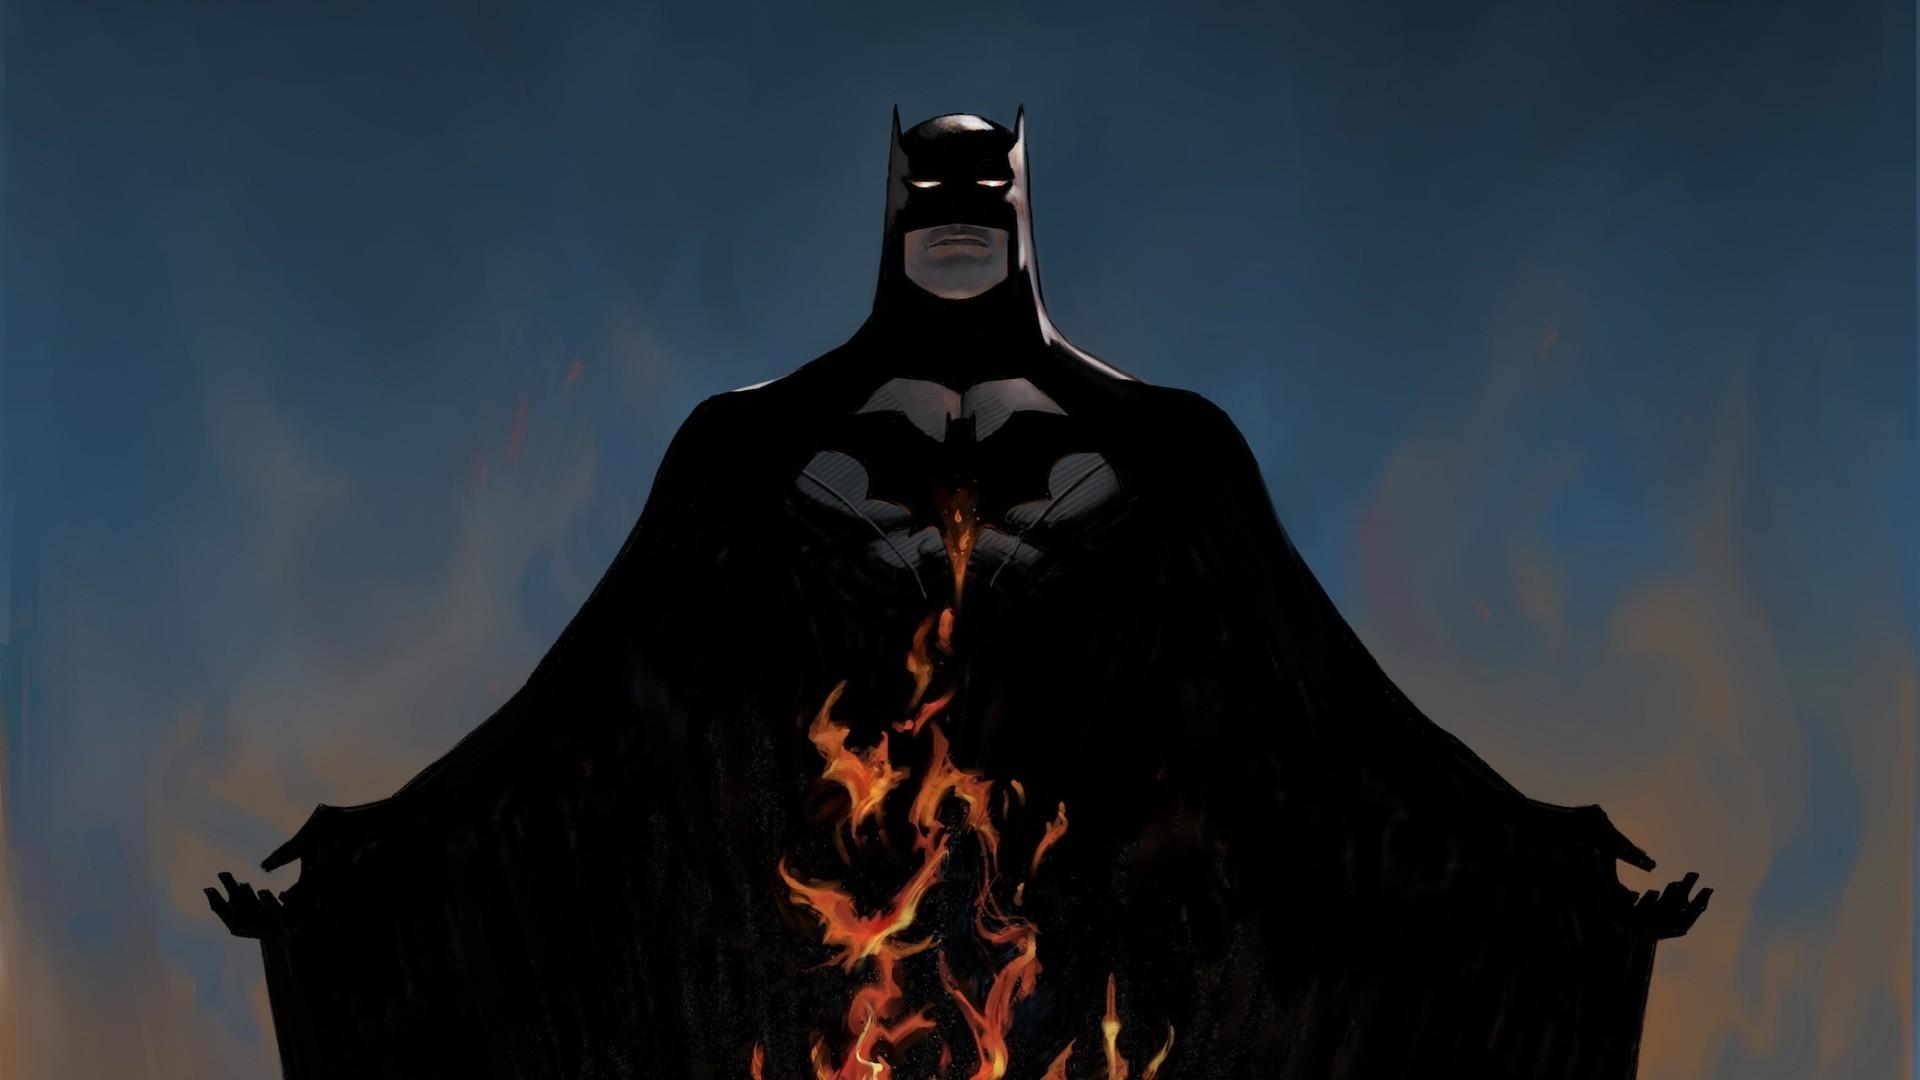 Batman Comic WallpaperWallpaperswidecom Batman Hd Desktop Wallpapers For  Joker Comic Wallpaper Wallpapersafari